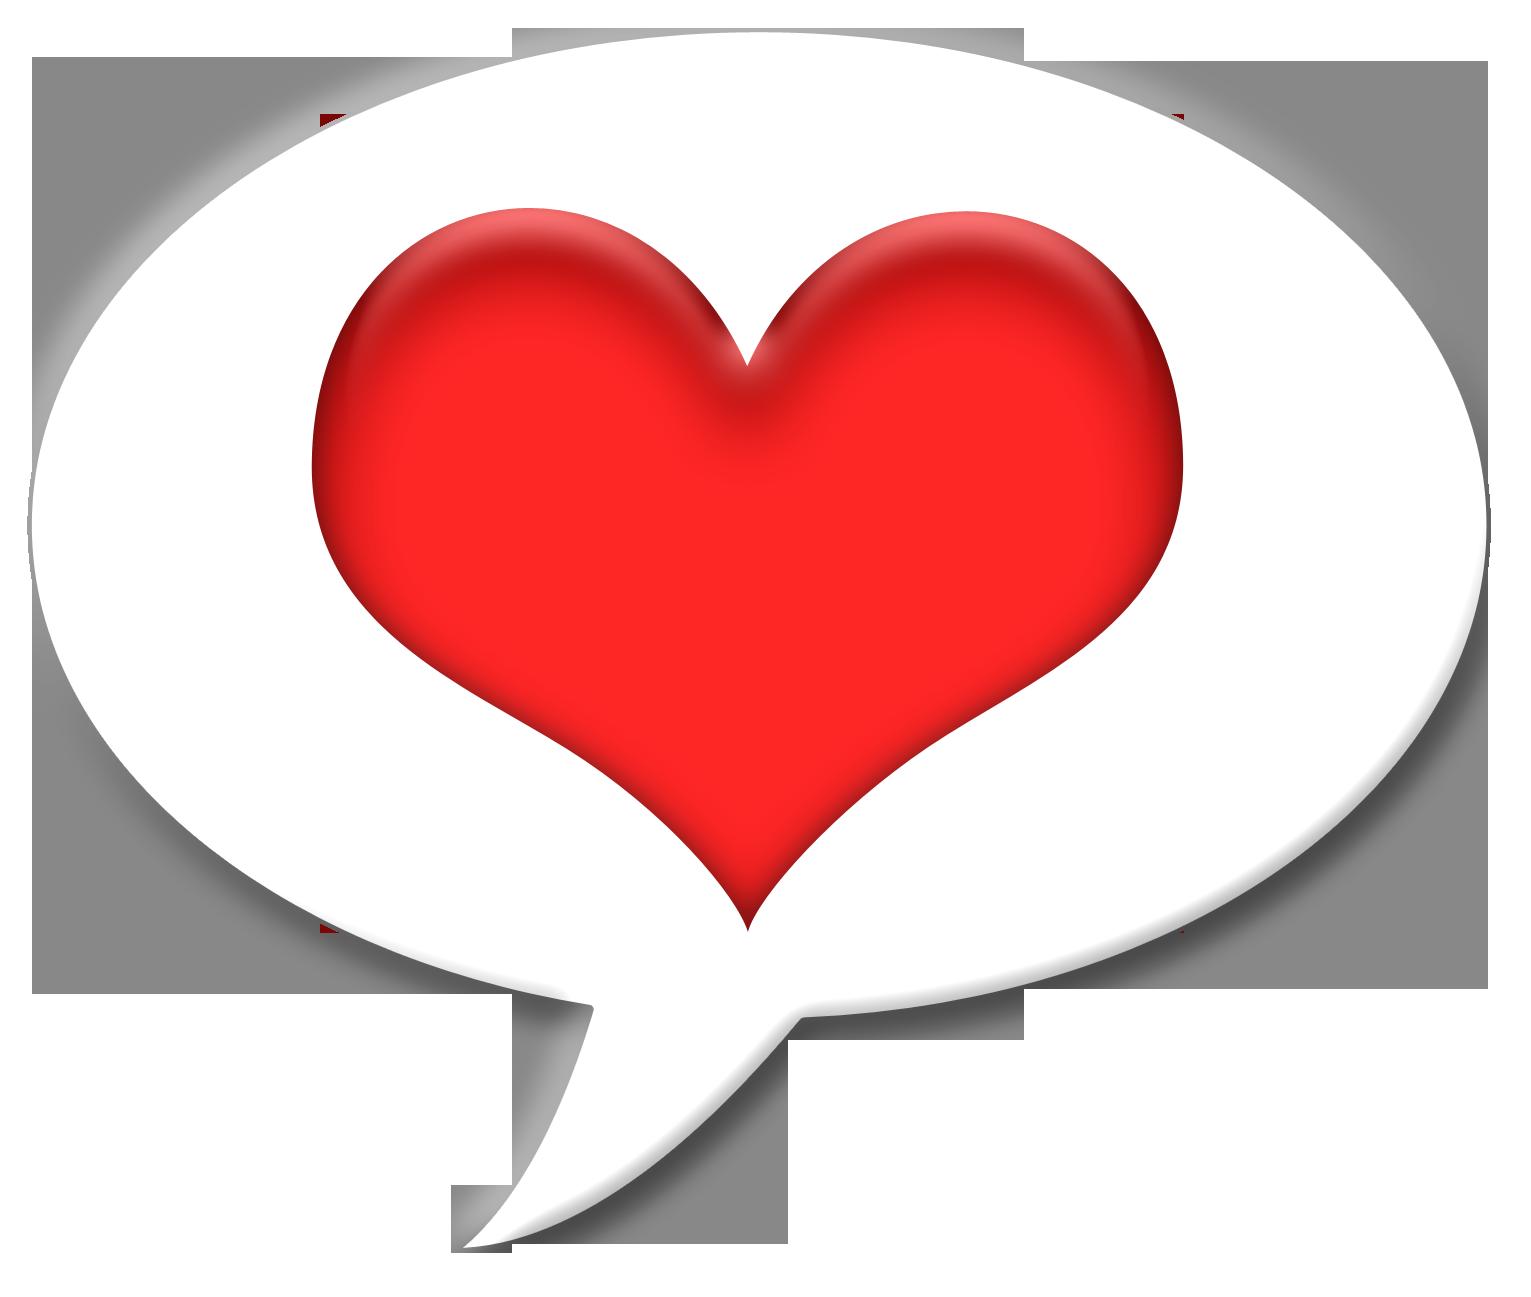 Heart cookie clipart jpg Clipart heart outline talk jpg